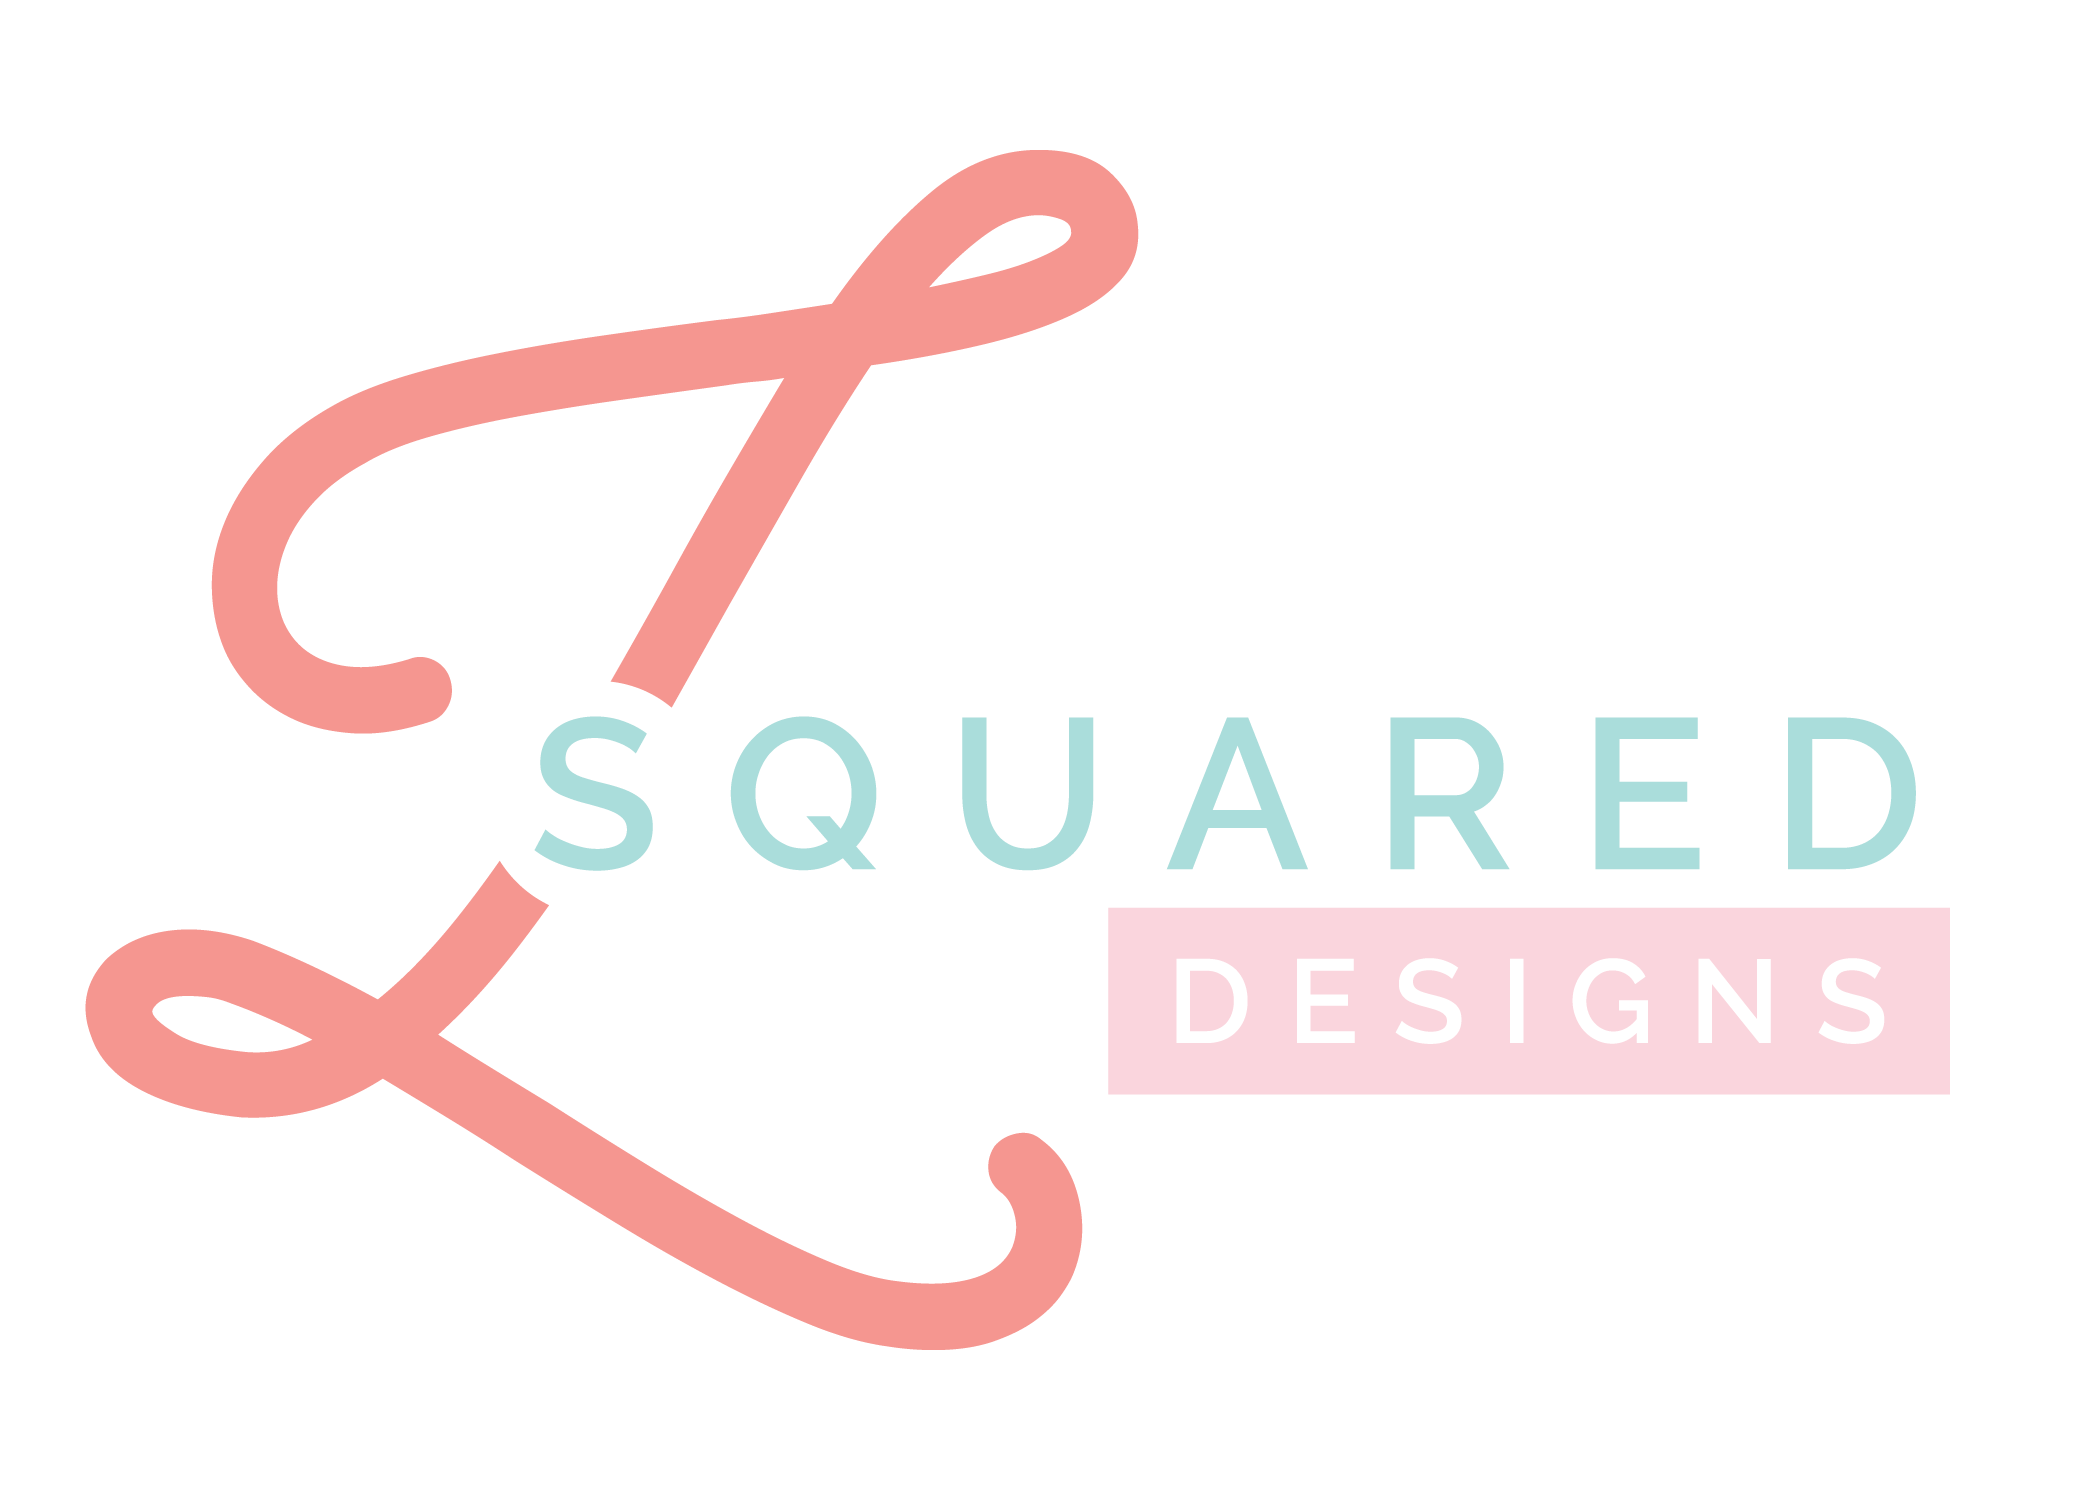 LSquared_logo_FINAL.png